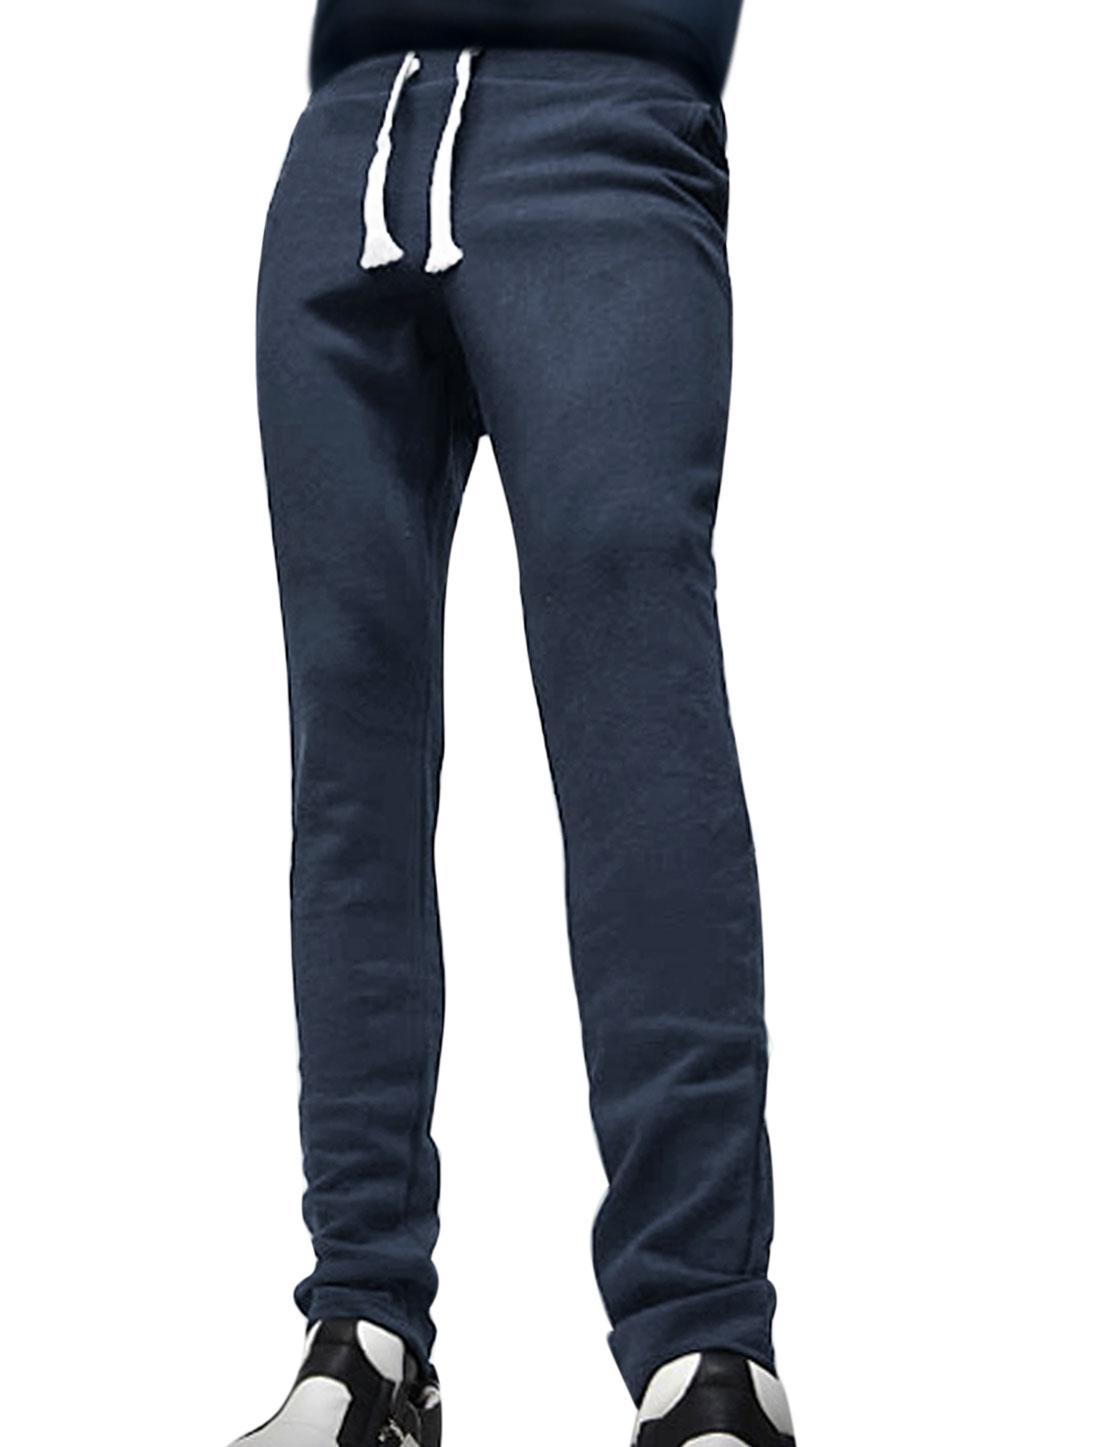 Men Drawstring Elastic Waist Tapered Slim Fit Pants Blue W32